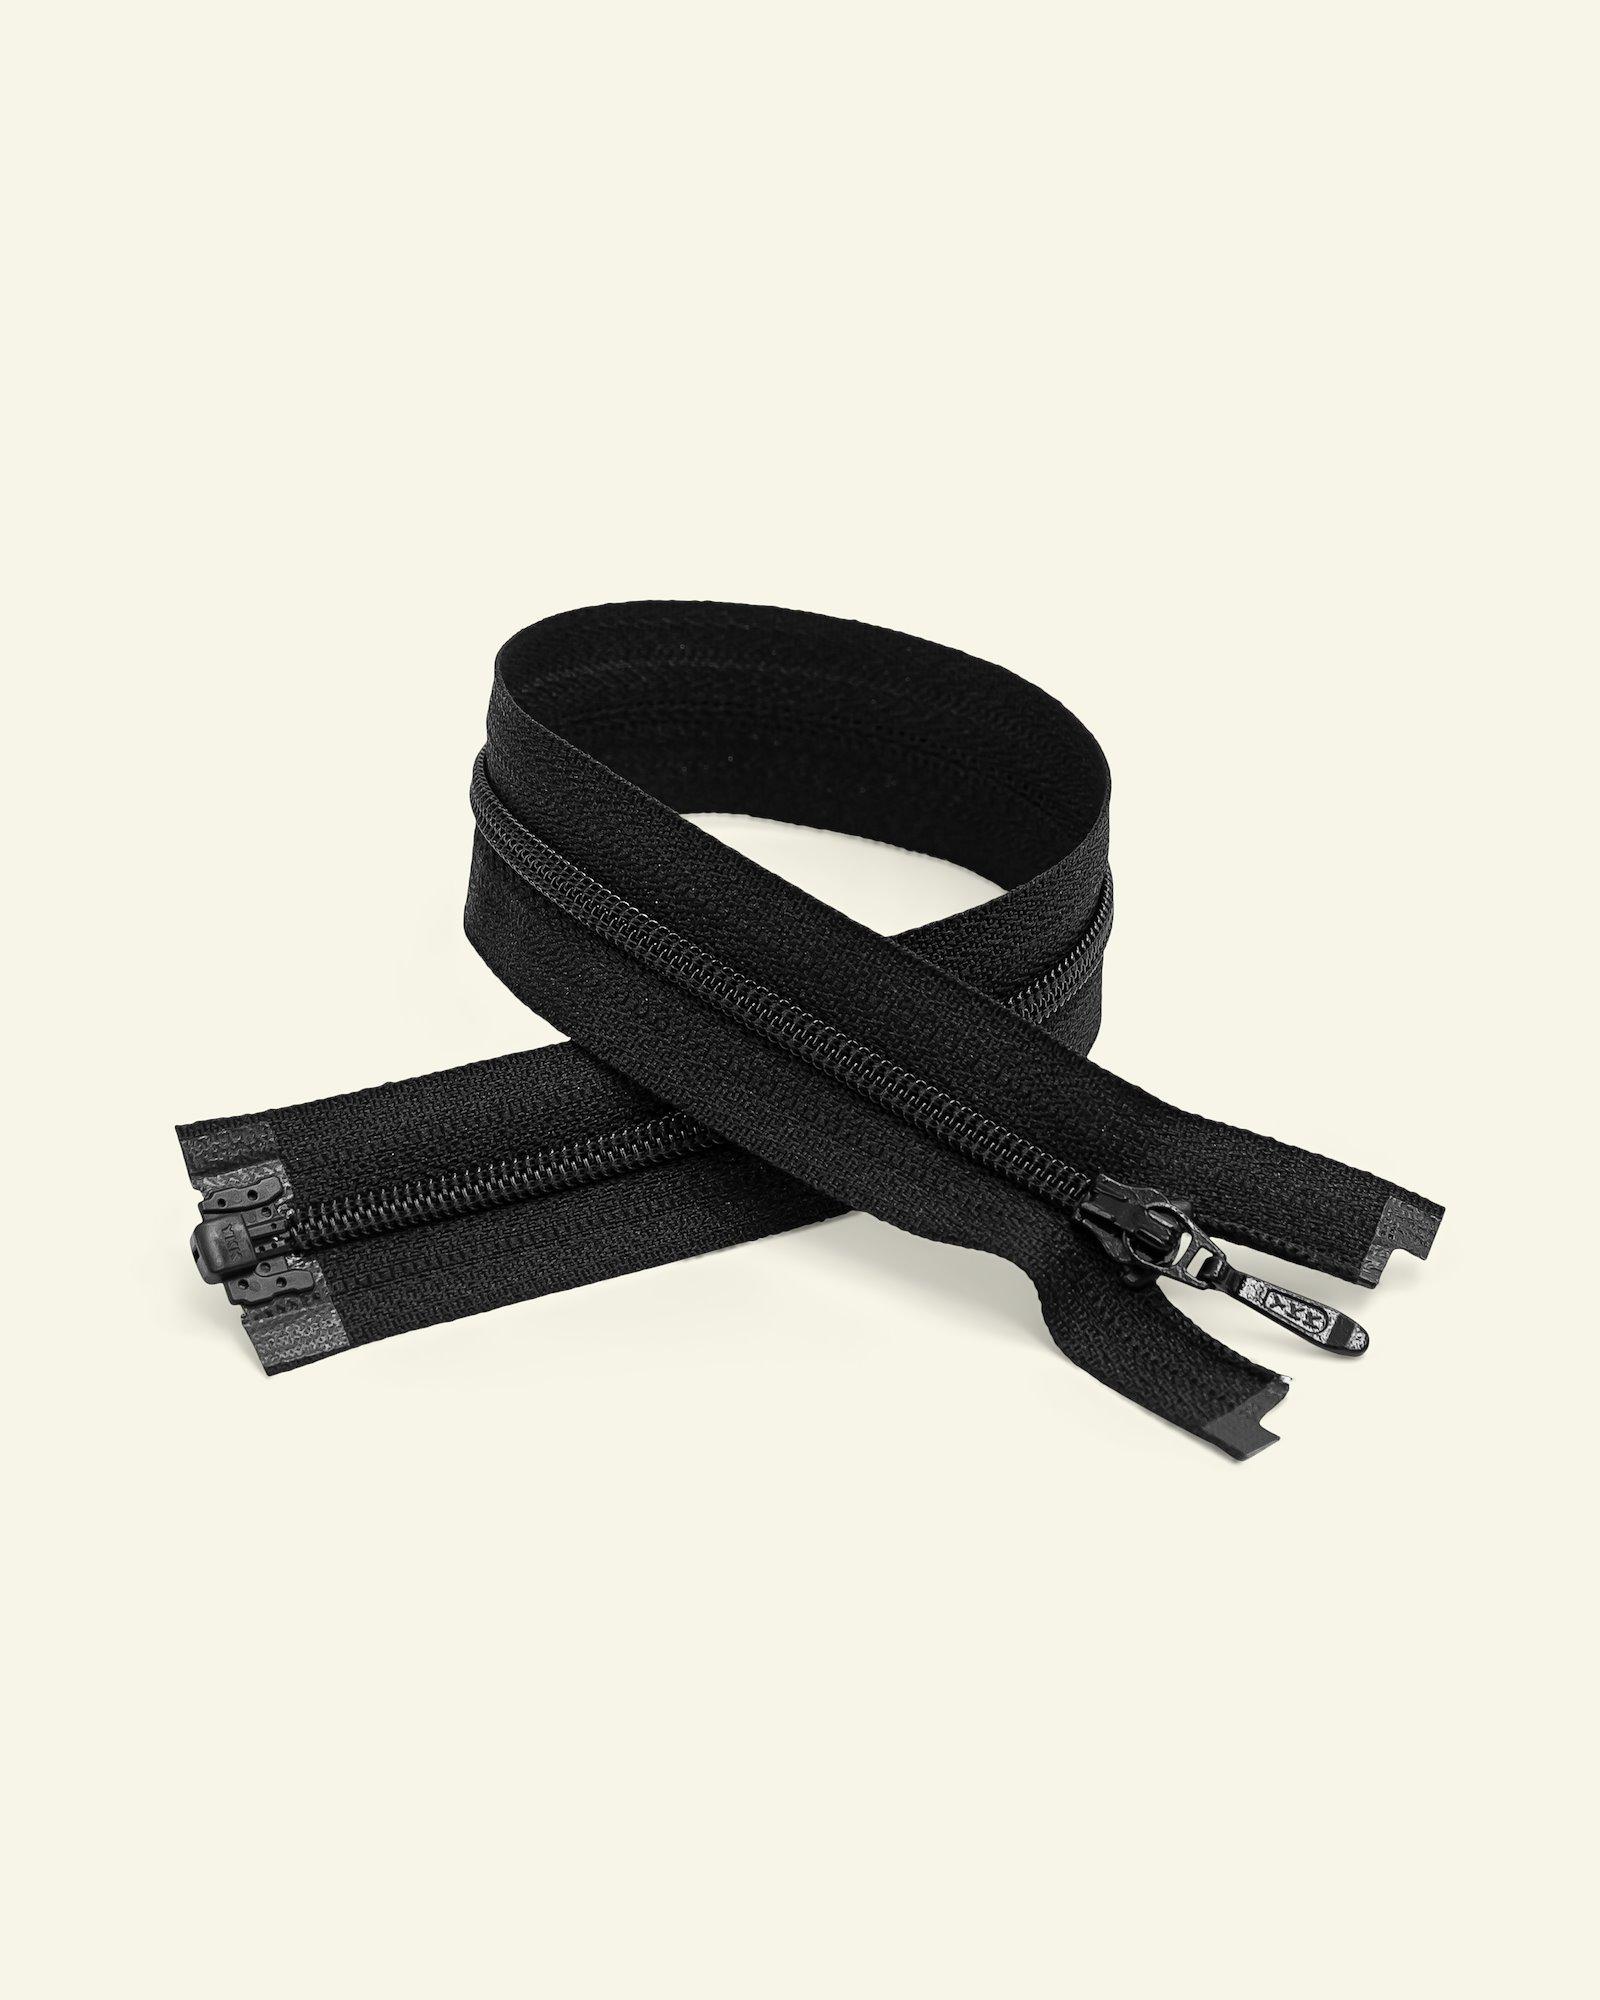 YKK zip 4mm coil open end black